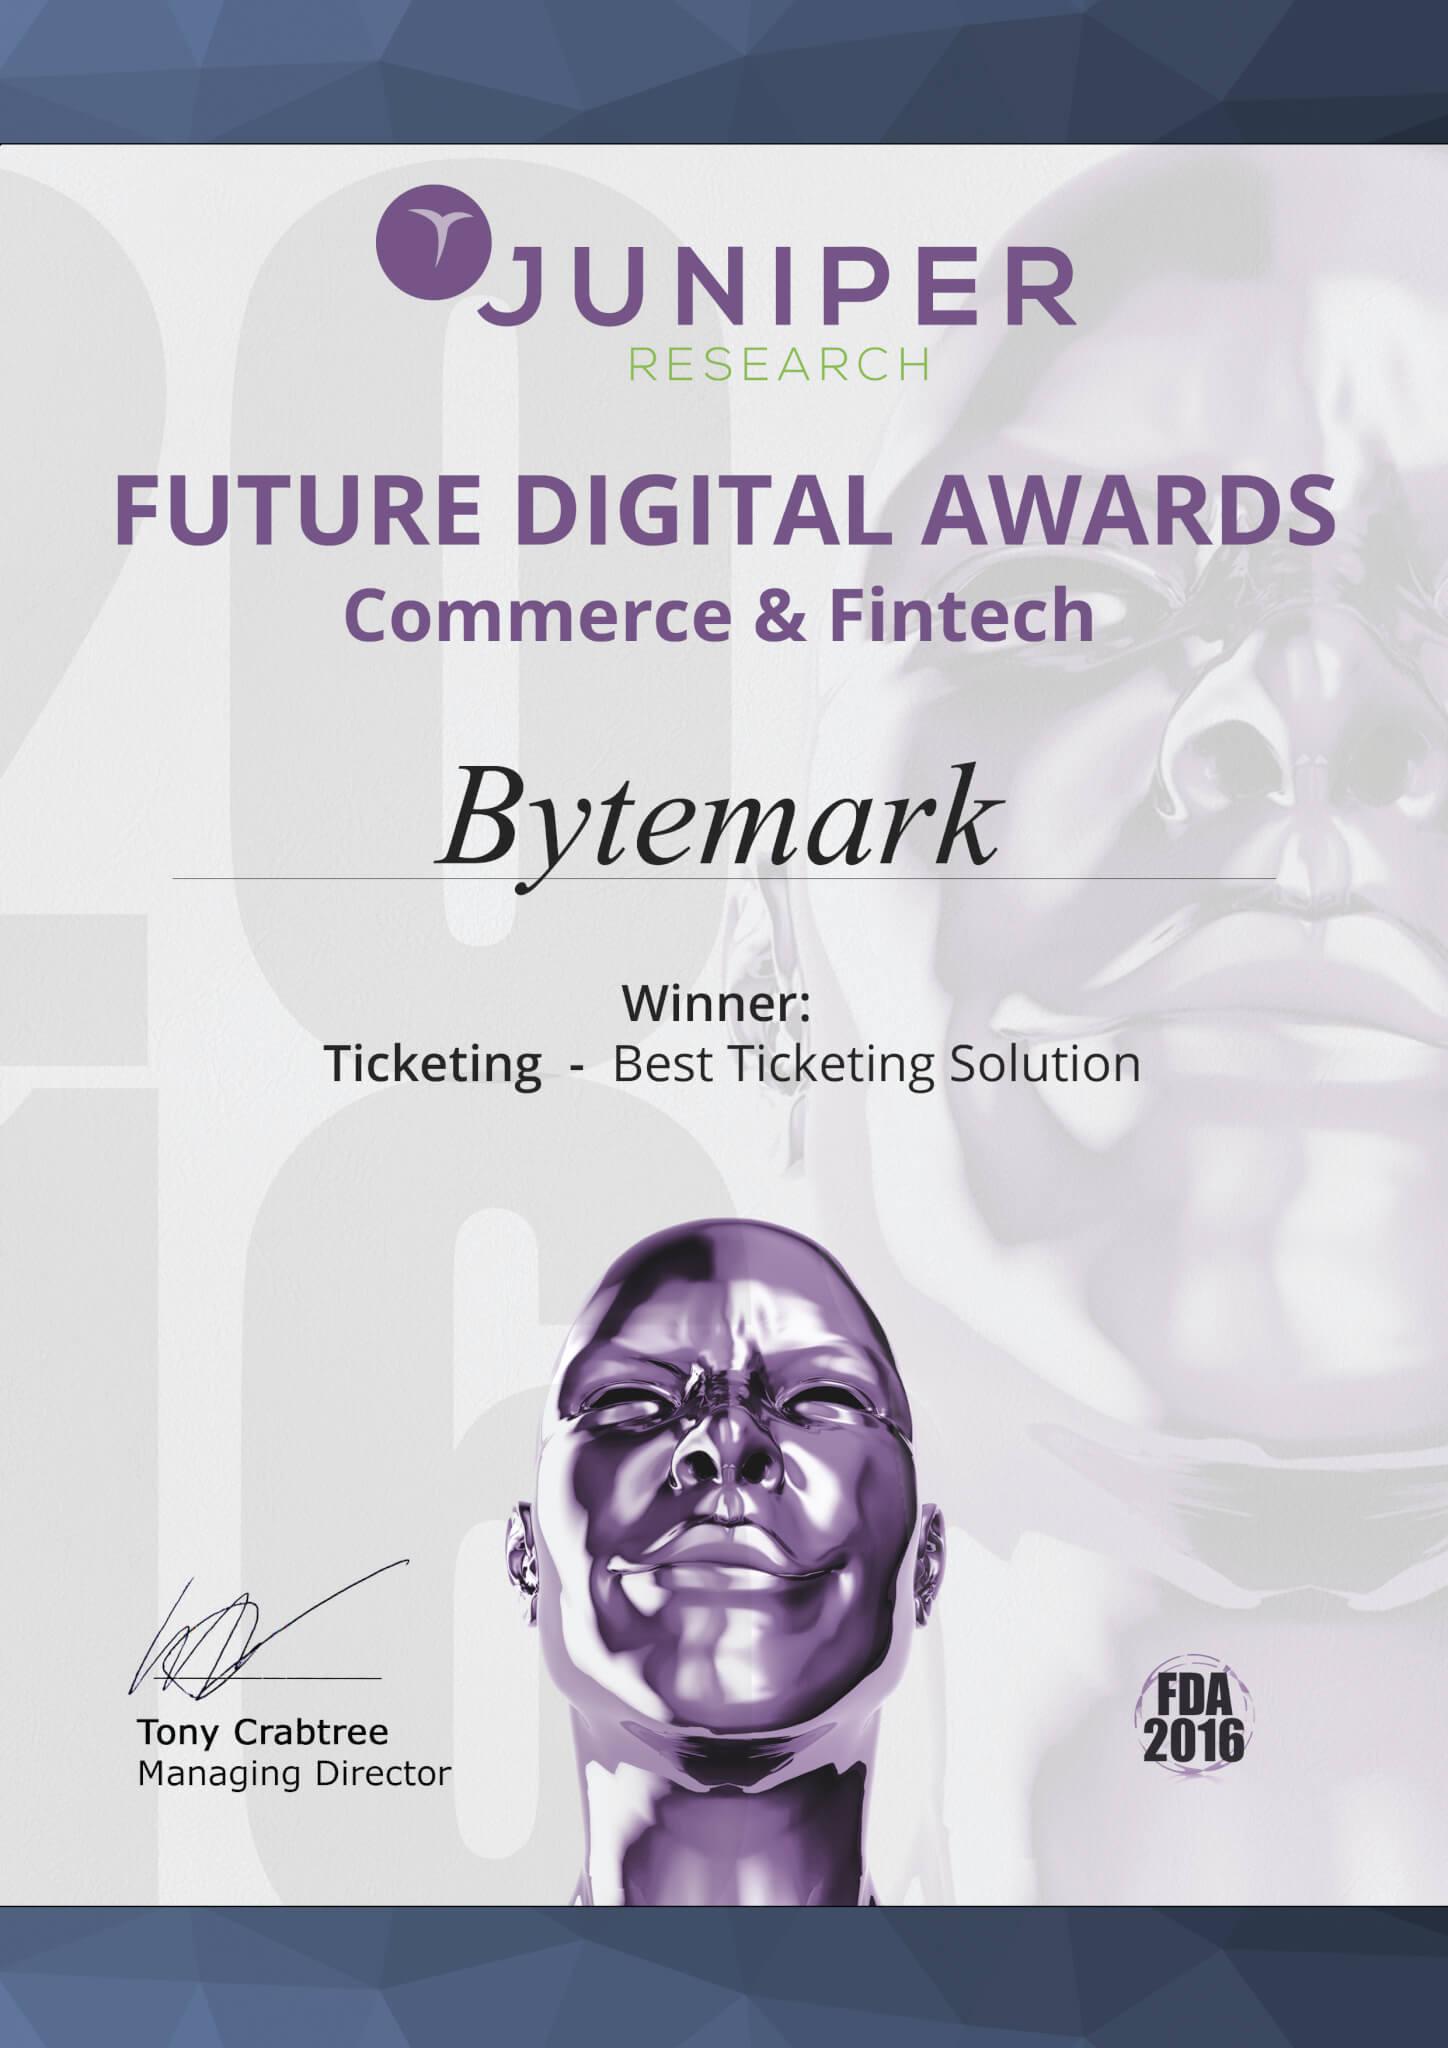 Best Ticketing Solution Award